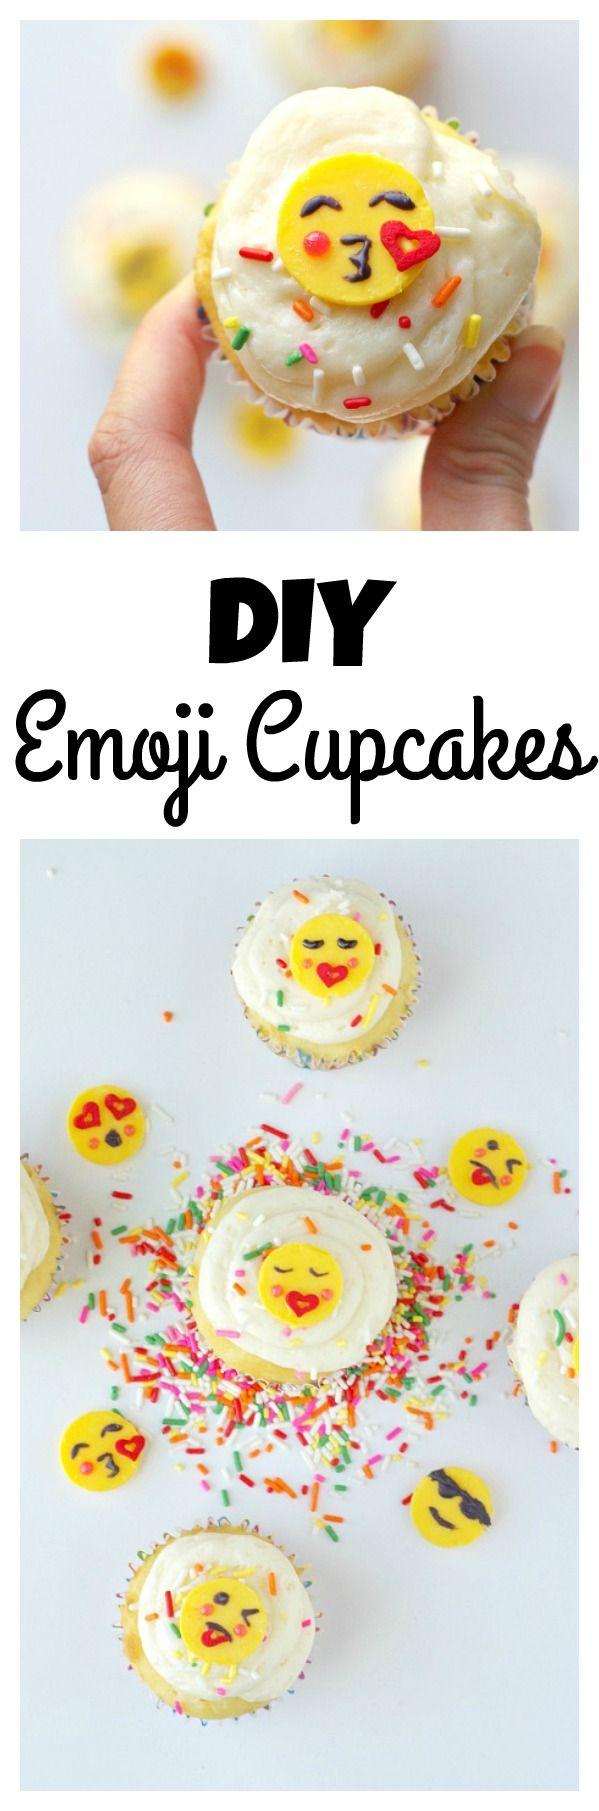 DIY Emoji Cupcakes! Anyone can make these simple emoji cupcakes for parties.